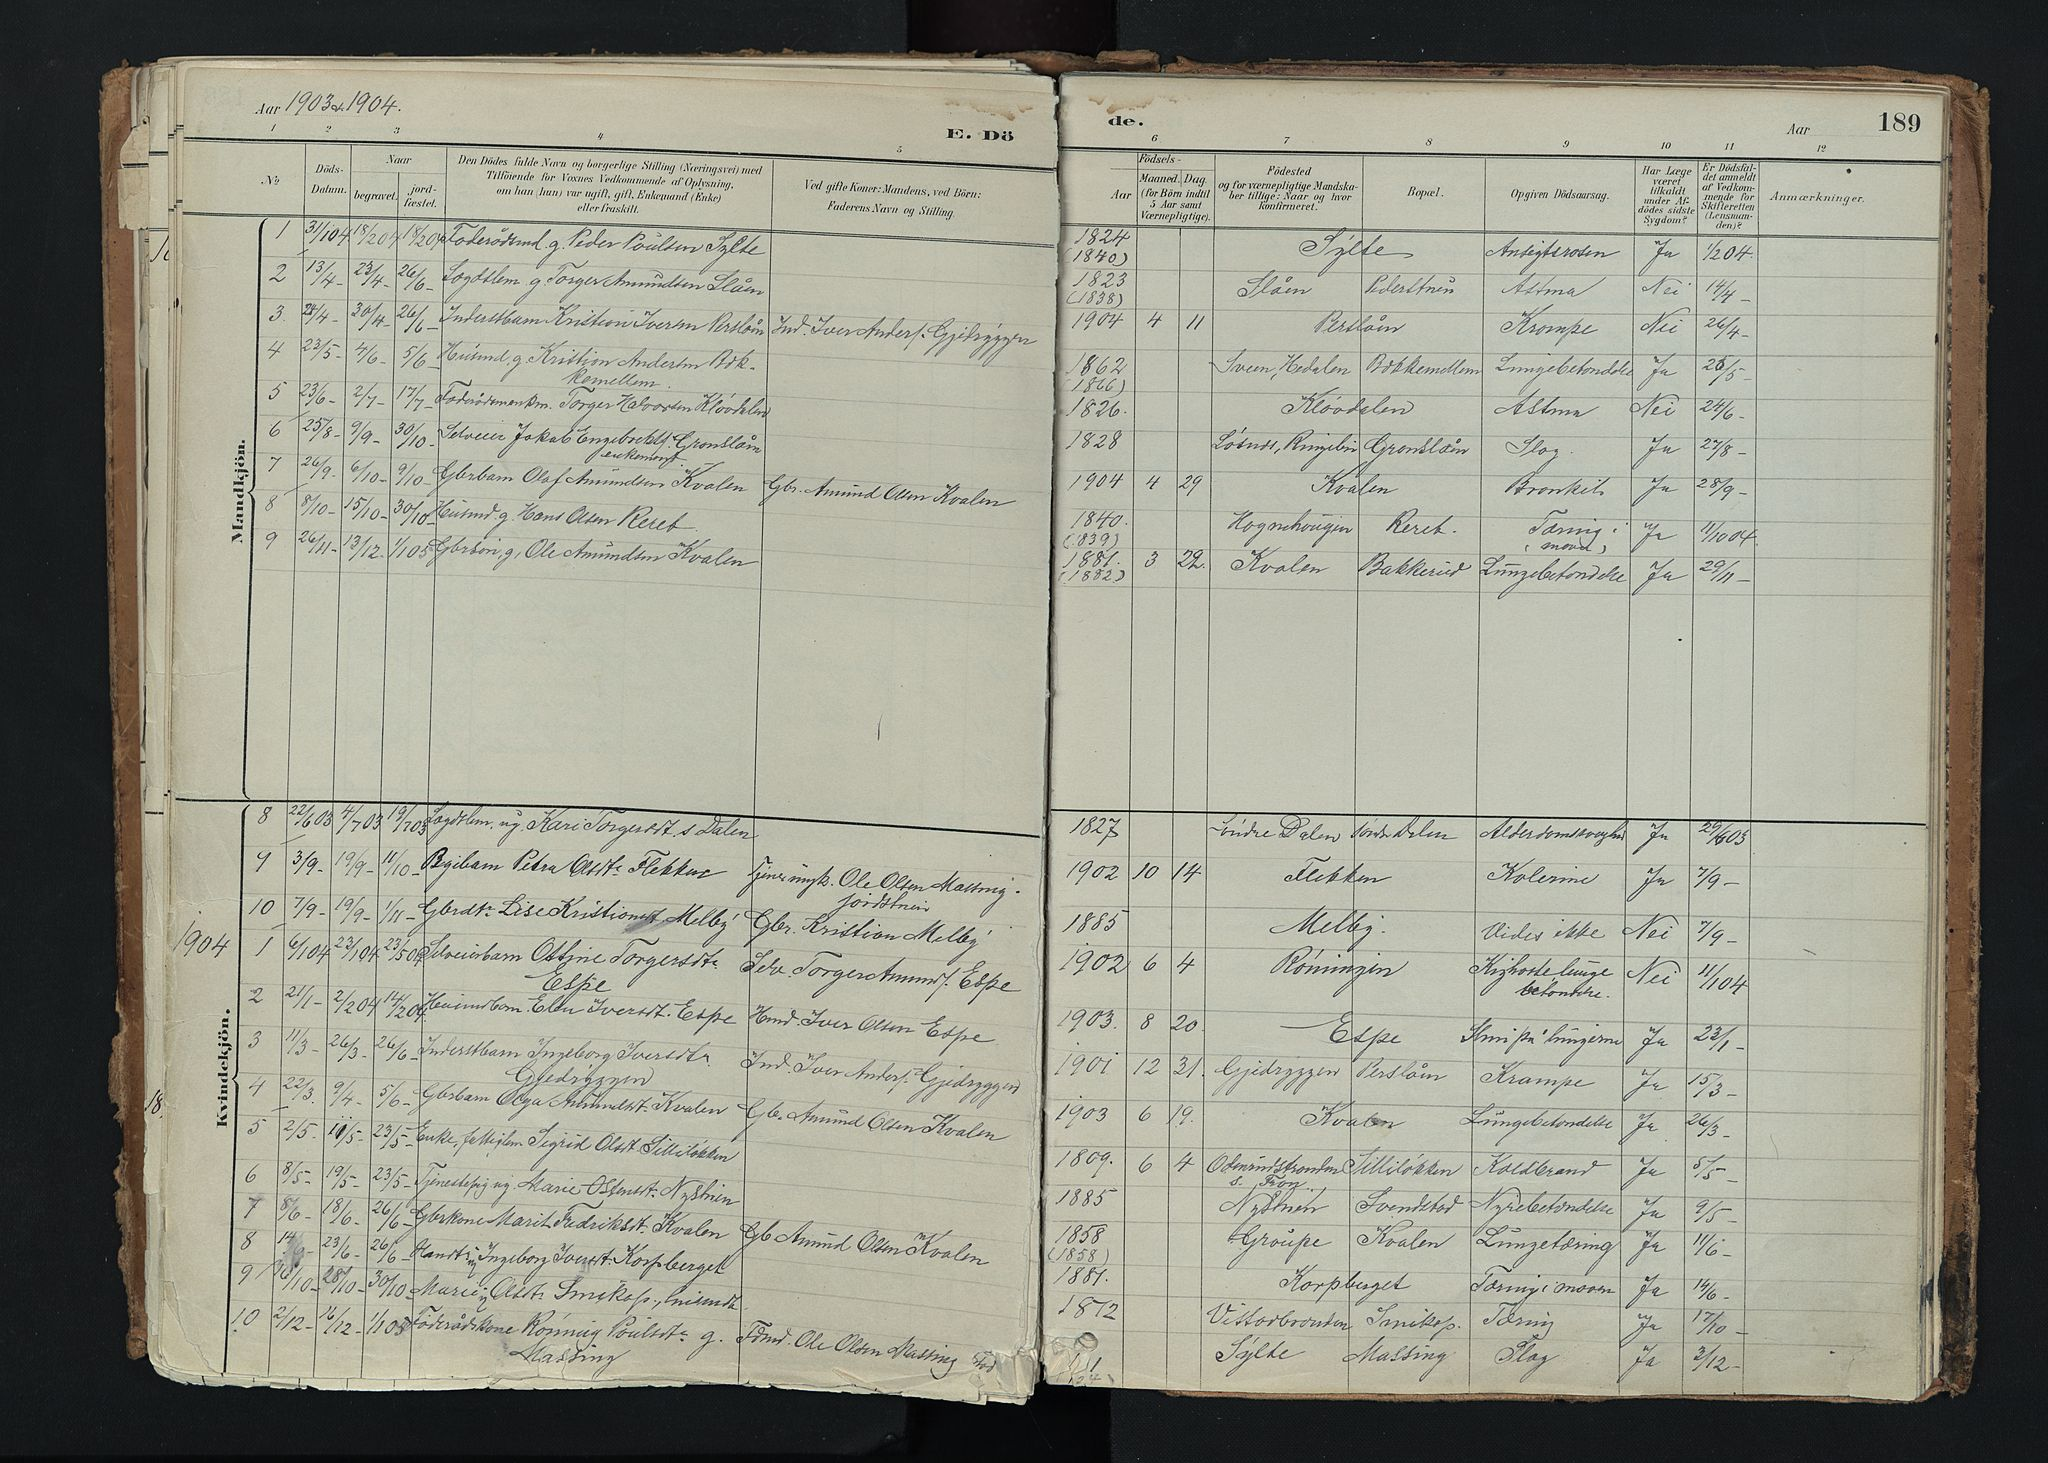 SAH, Nord-Fron prestekontor, Ministerialbok nr. 5, 1884-1914, s. 189